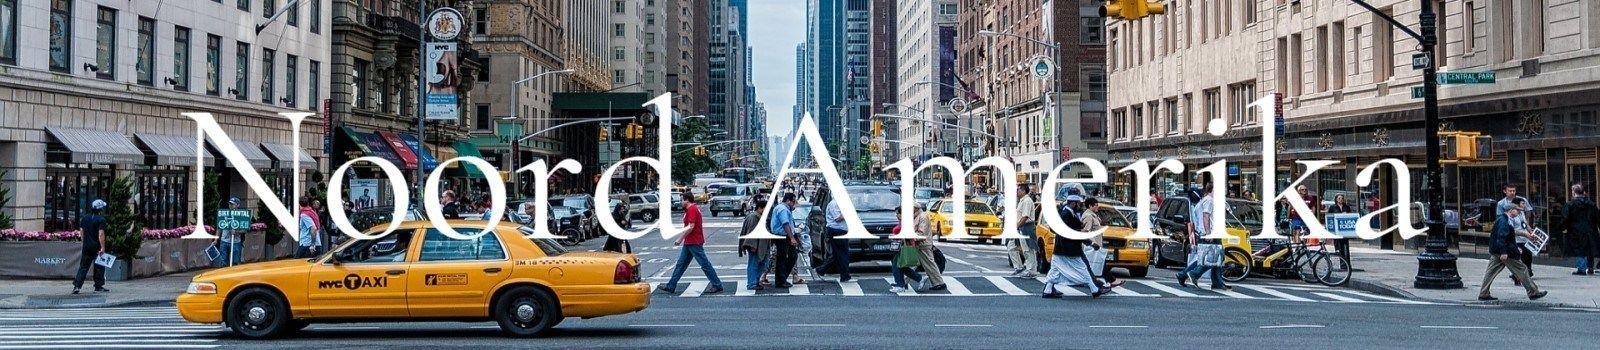 noord amerika new york